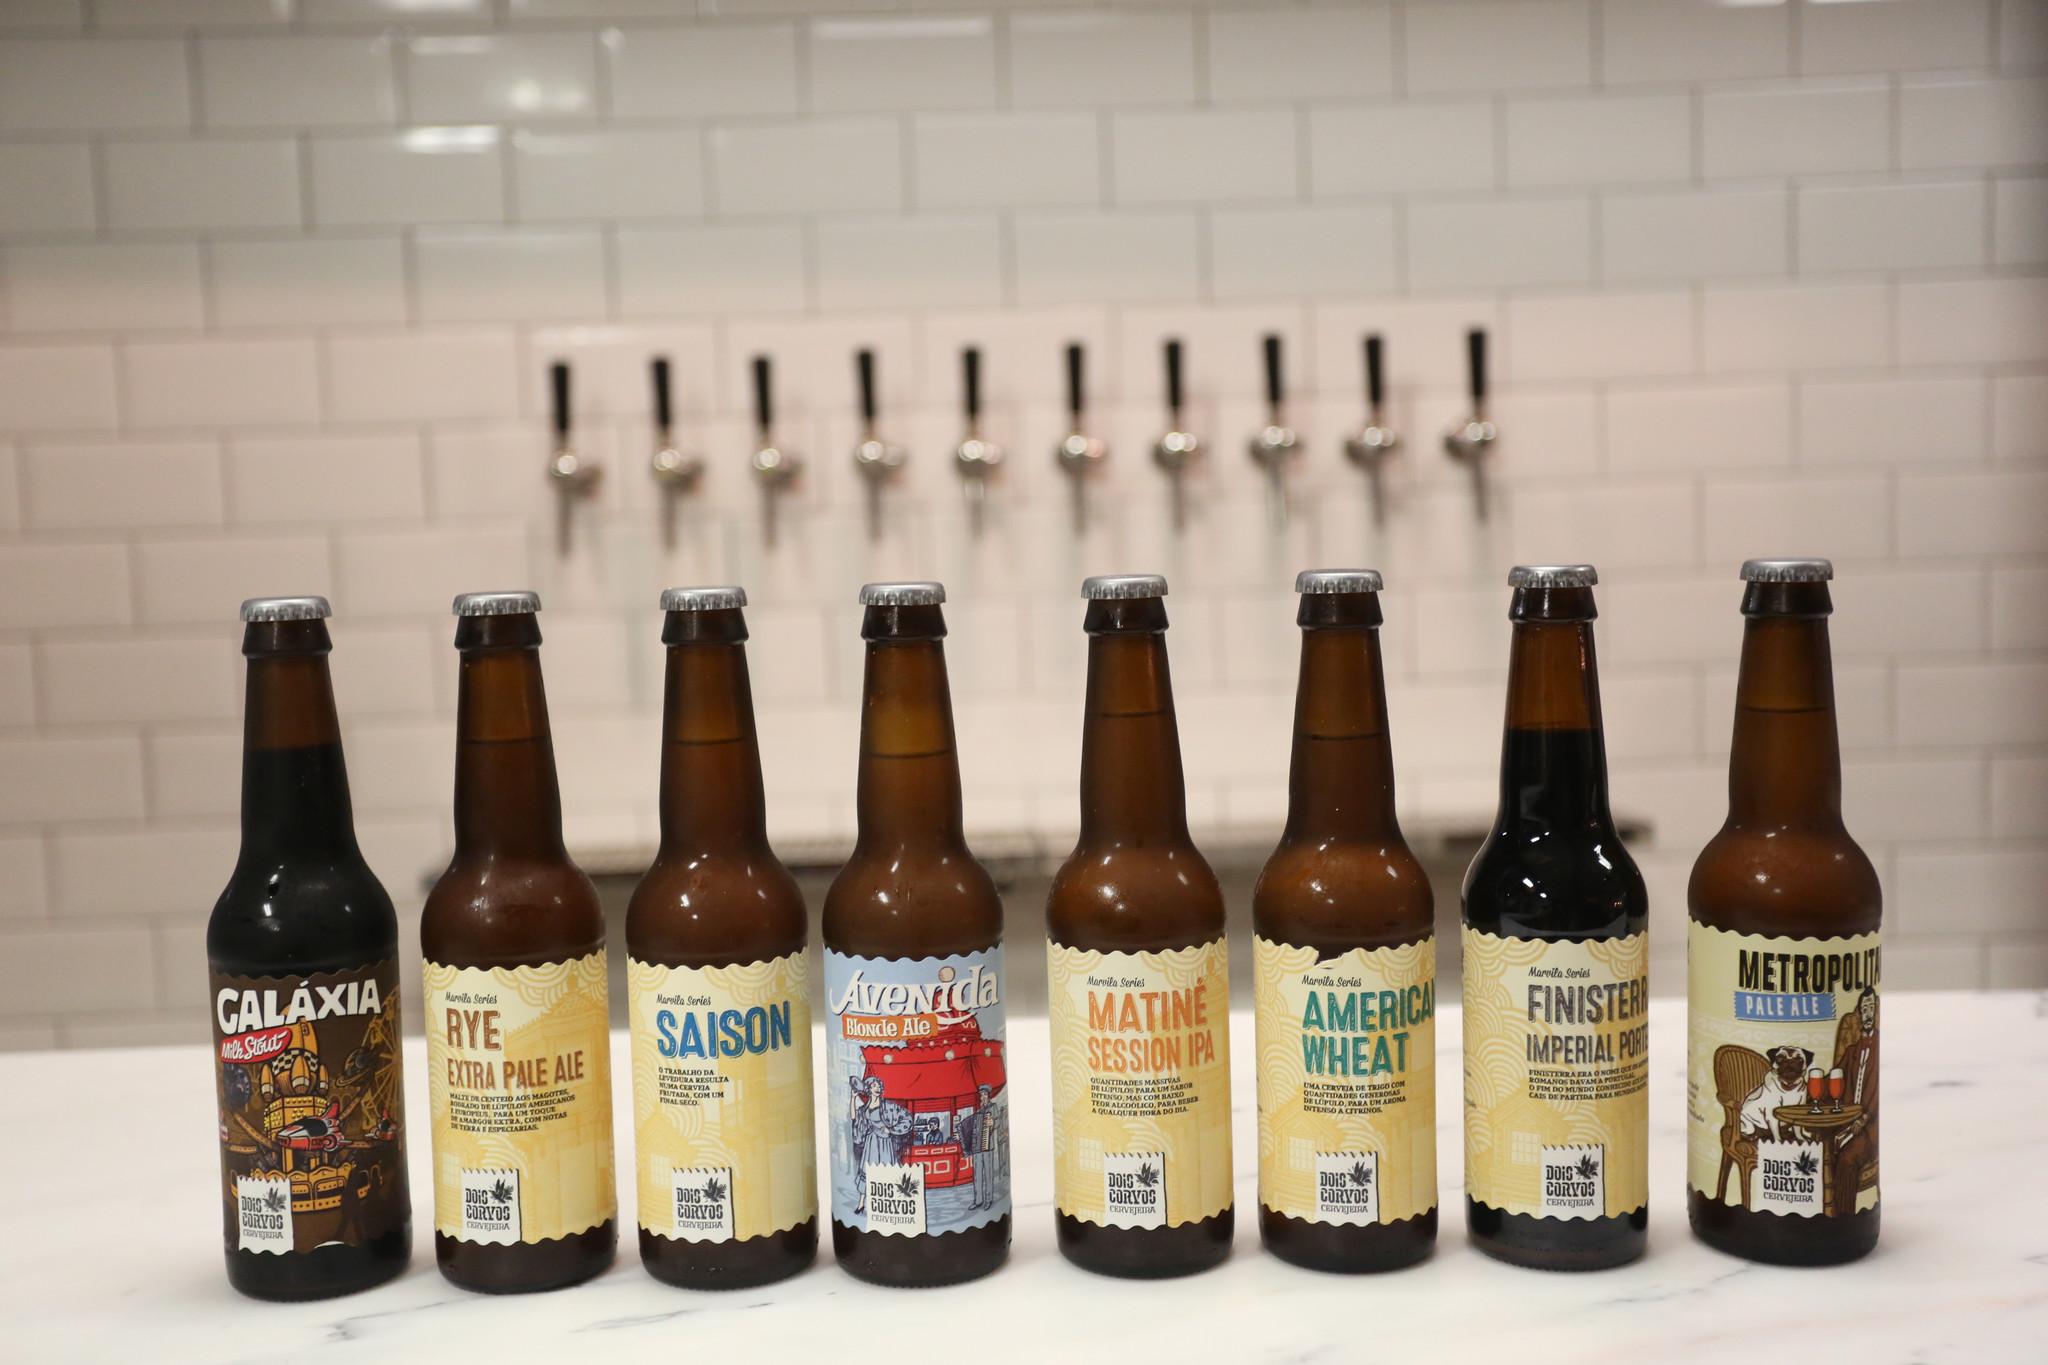 nb5 cervejeira 2 corvos 05.jpg